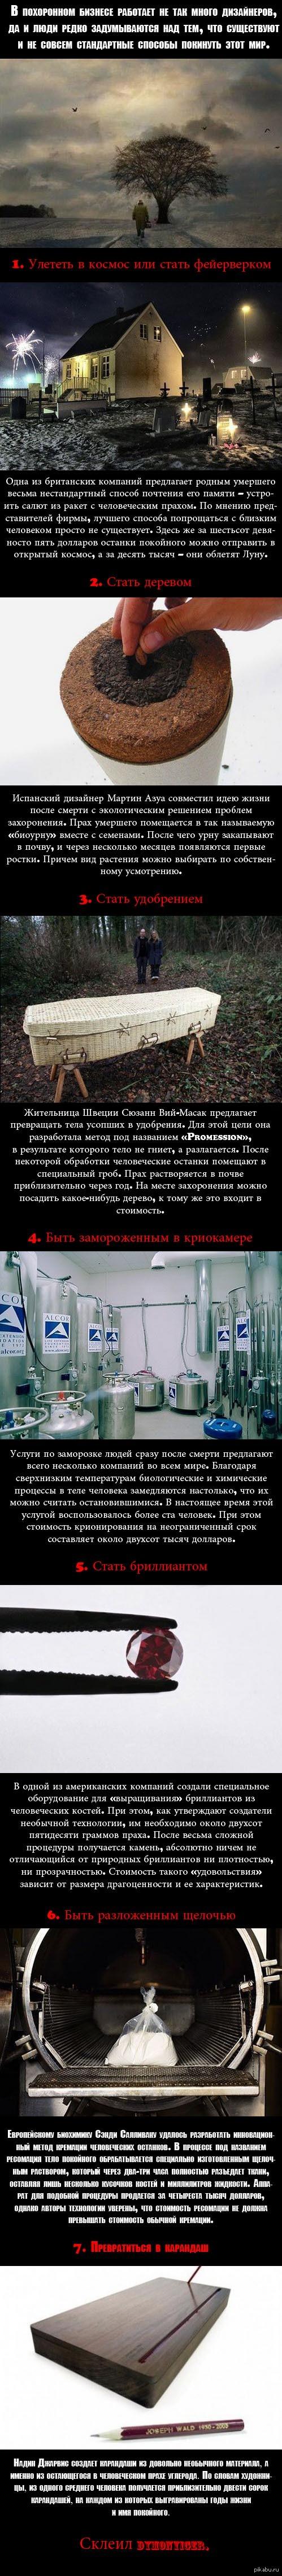 http://s.pikabu.ru/post_img/2013/03/04/7/1362389828_2114697569.jpg